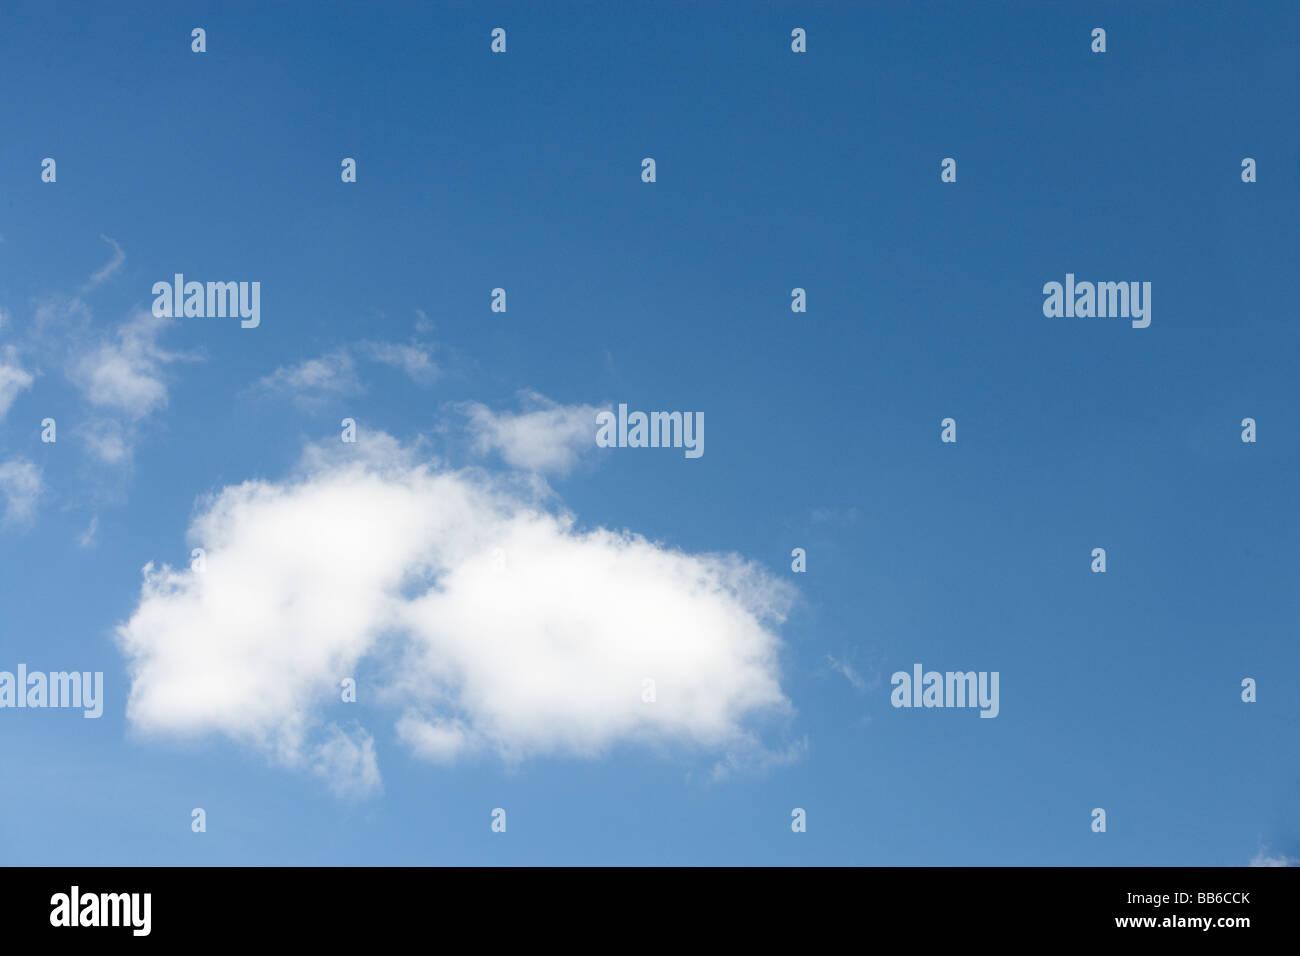 White Fluffy Cloud Against Blue Sky - Stock Image